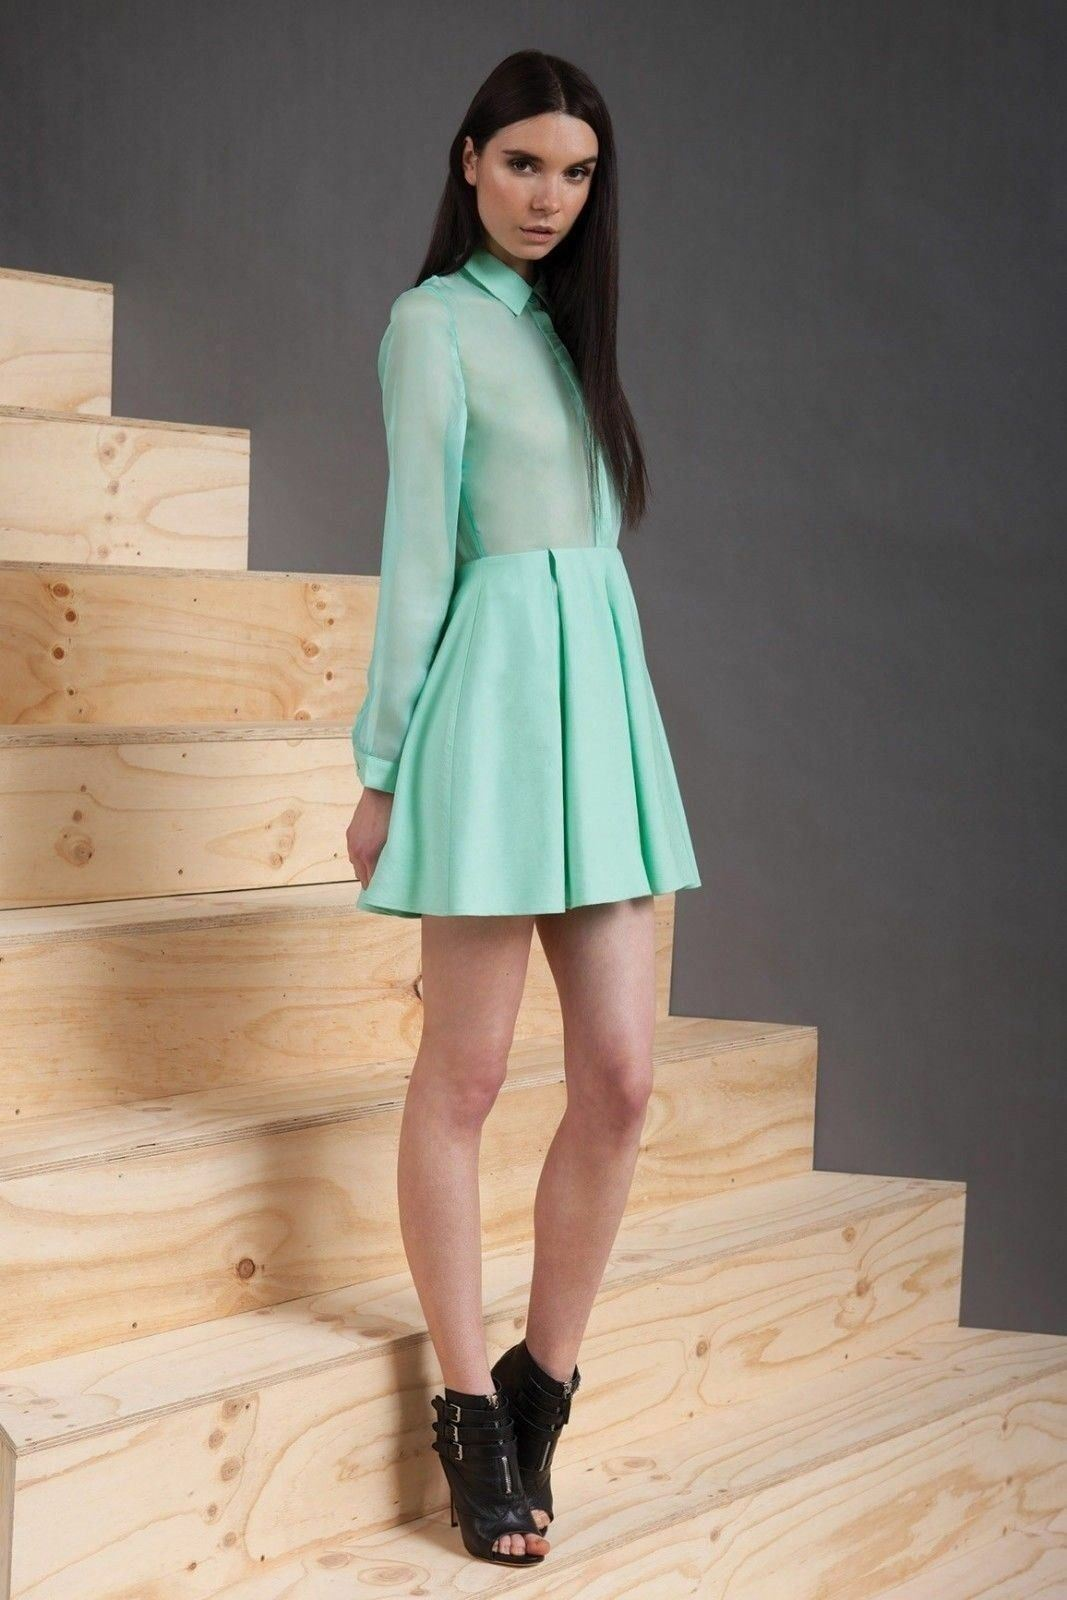 NEW Designer Cameo Sheer Top Button Down Shelter Dress Shirt S GORGEOUS